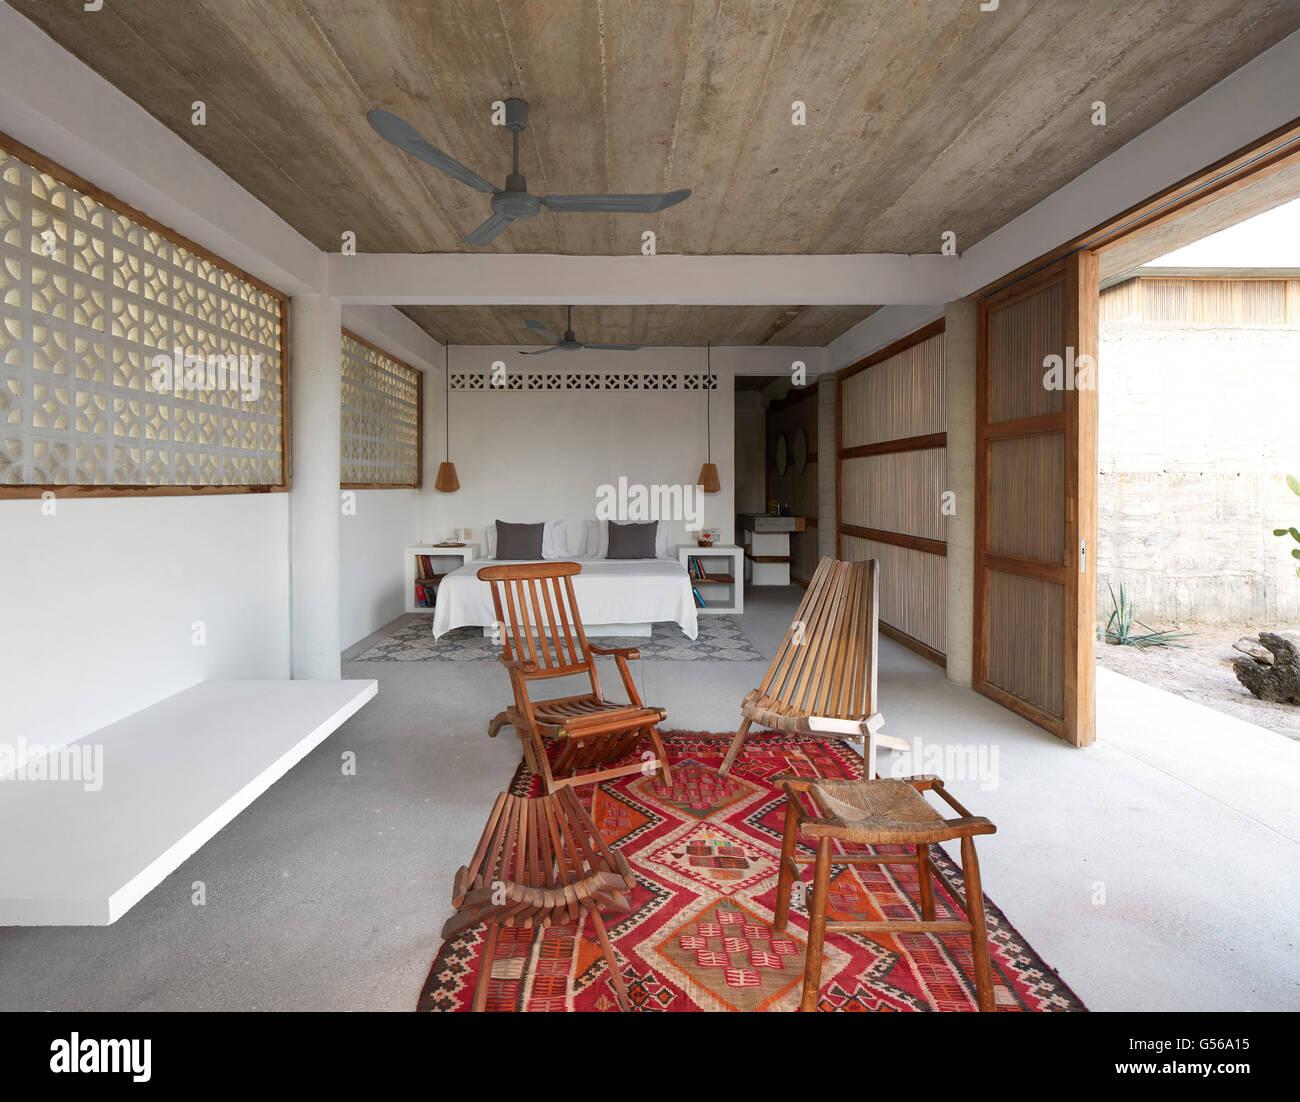 Lower level bedroom. Casa Cal, Puerto Escondido, Mexico. Architect: BAAQ, 2015. - Stock Image